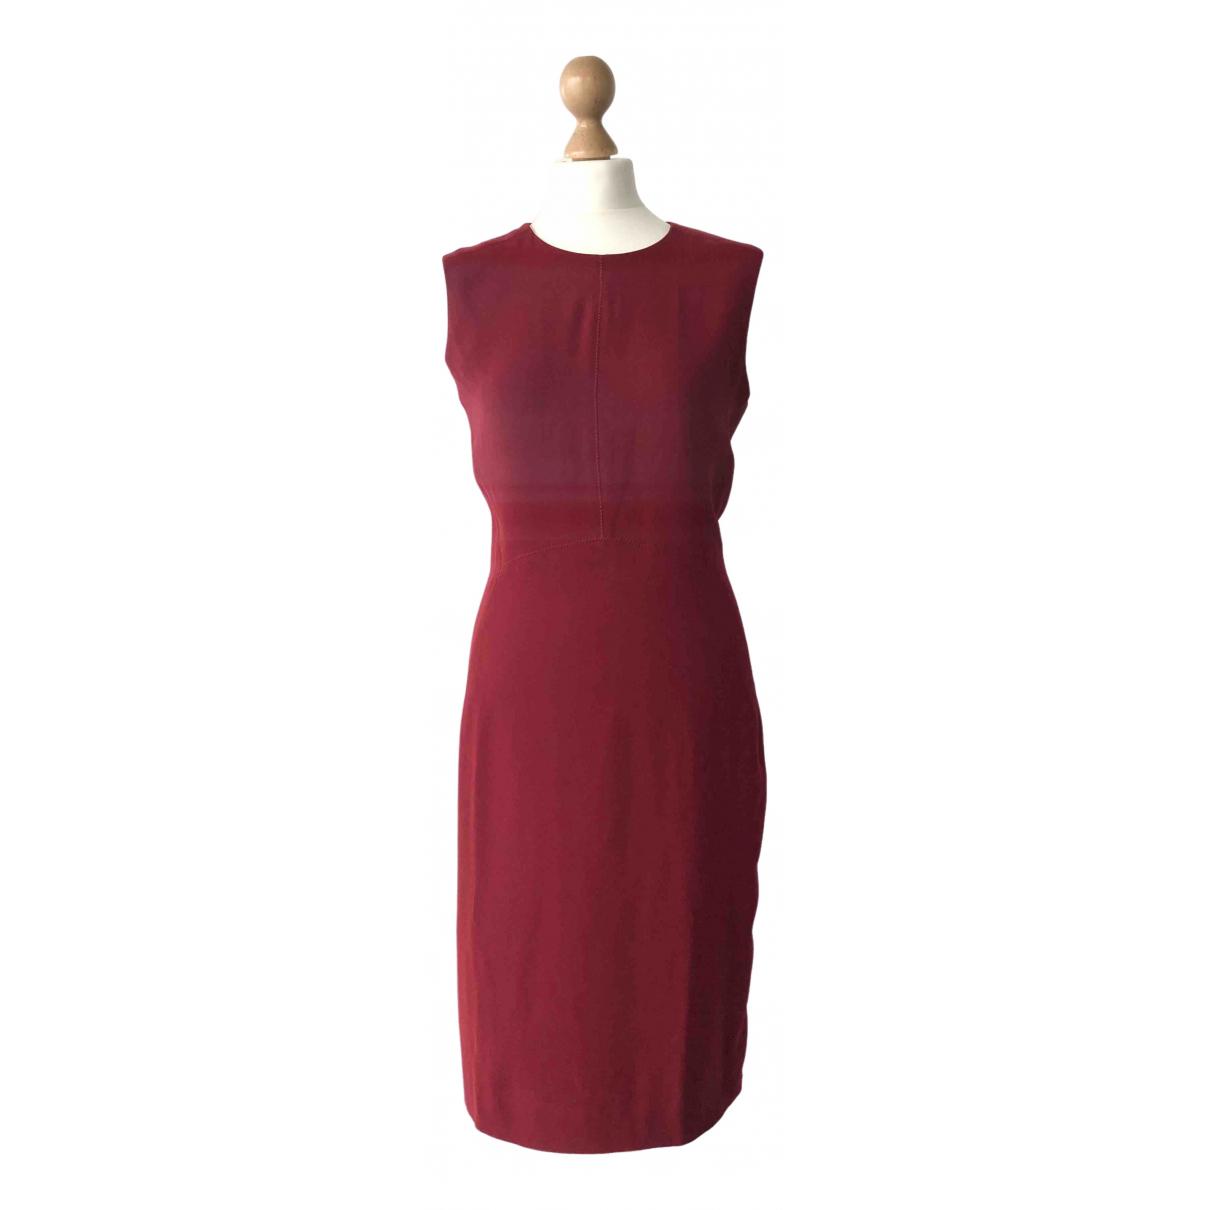 Joseph \N Kleid in  Bordeauxrot Synthetik